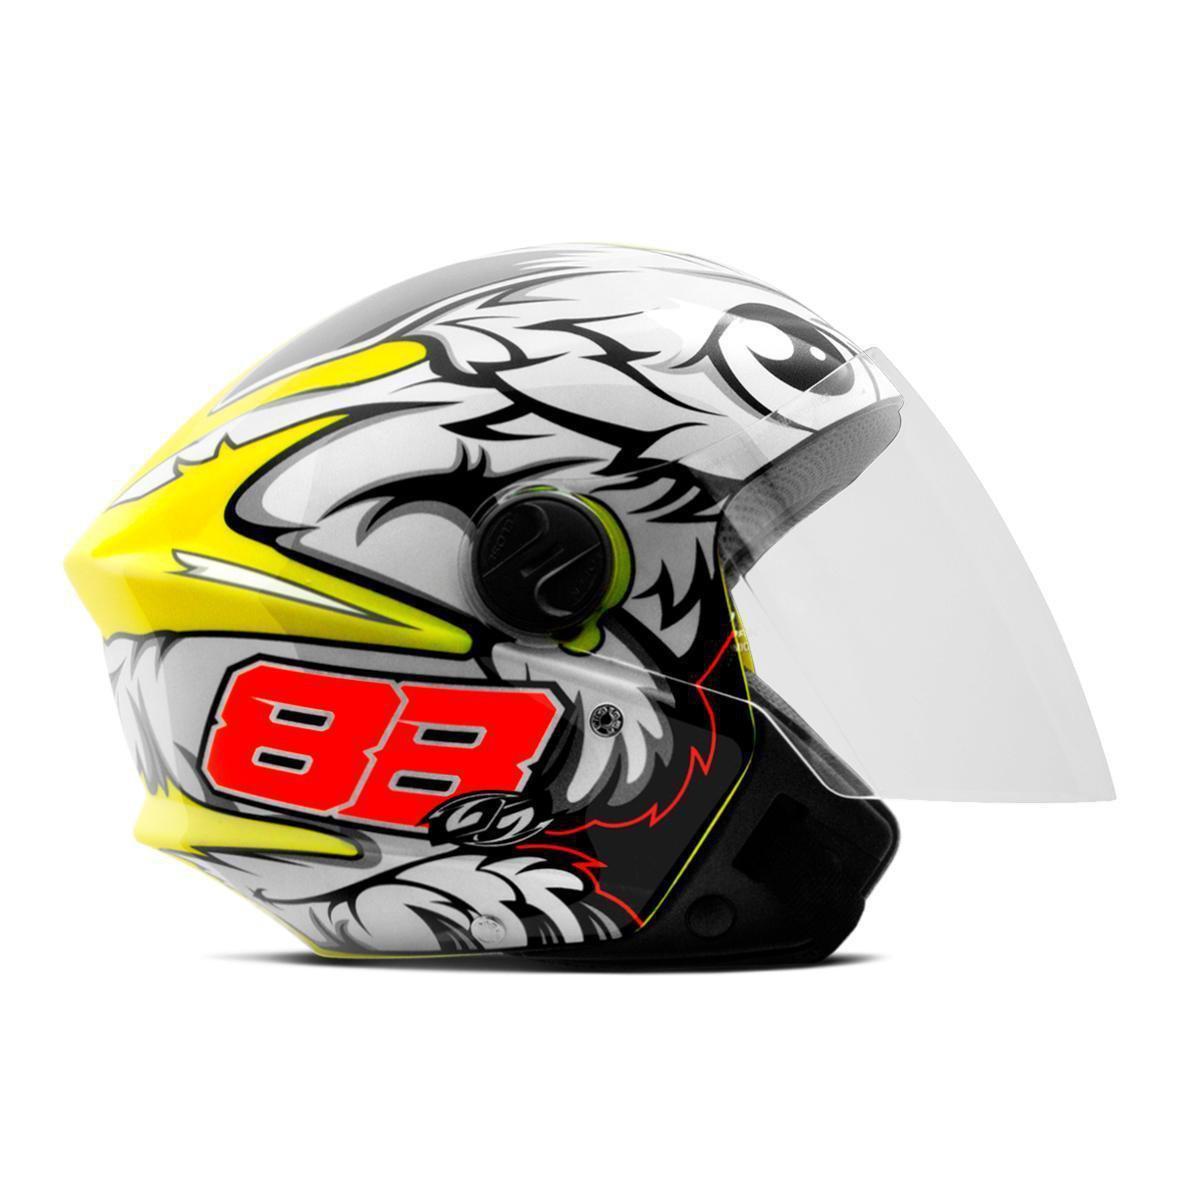 Capacete de moto Pro Tork New Liberty 3 GP 88 (amarelo brilhante)